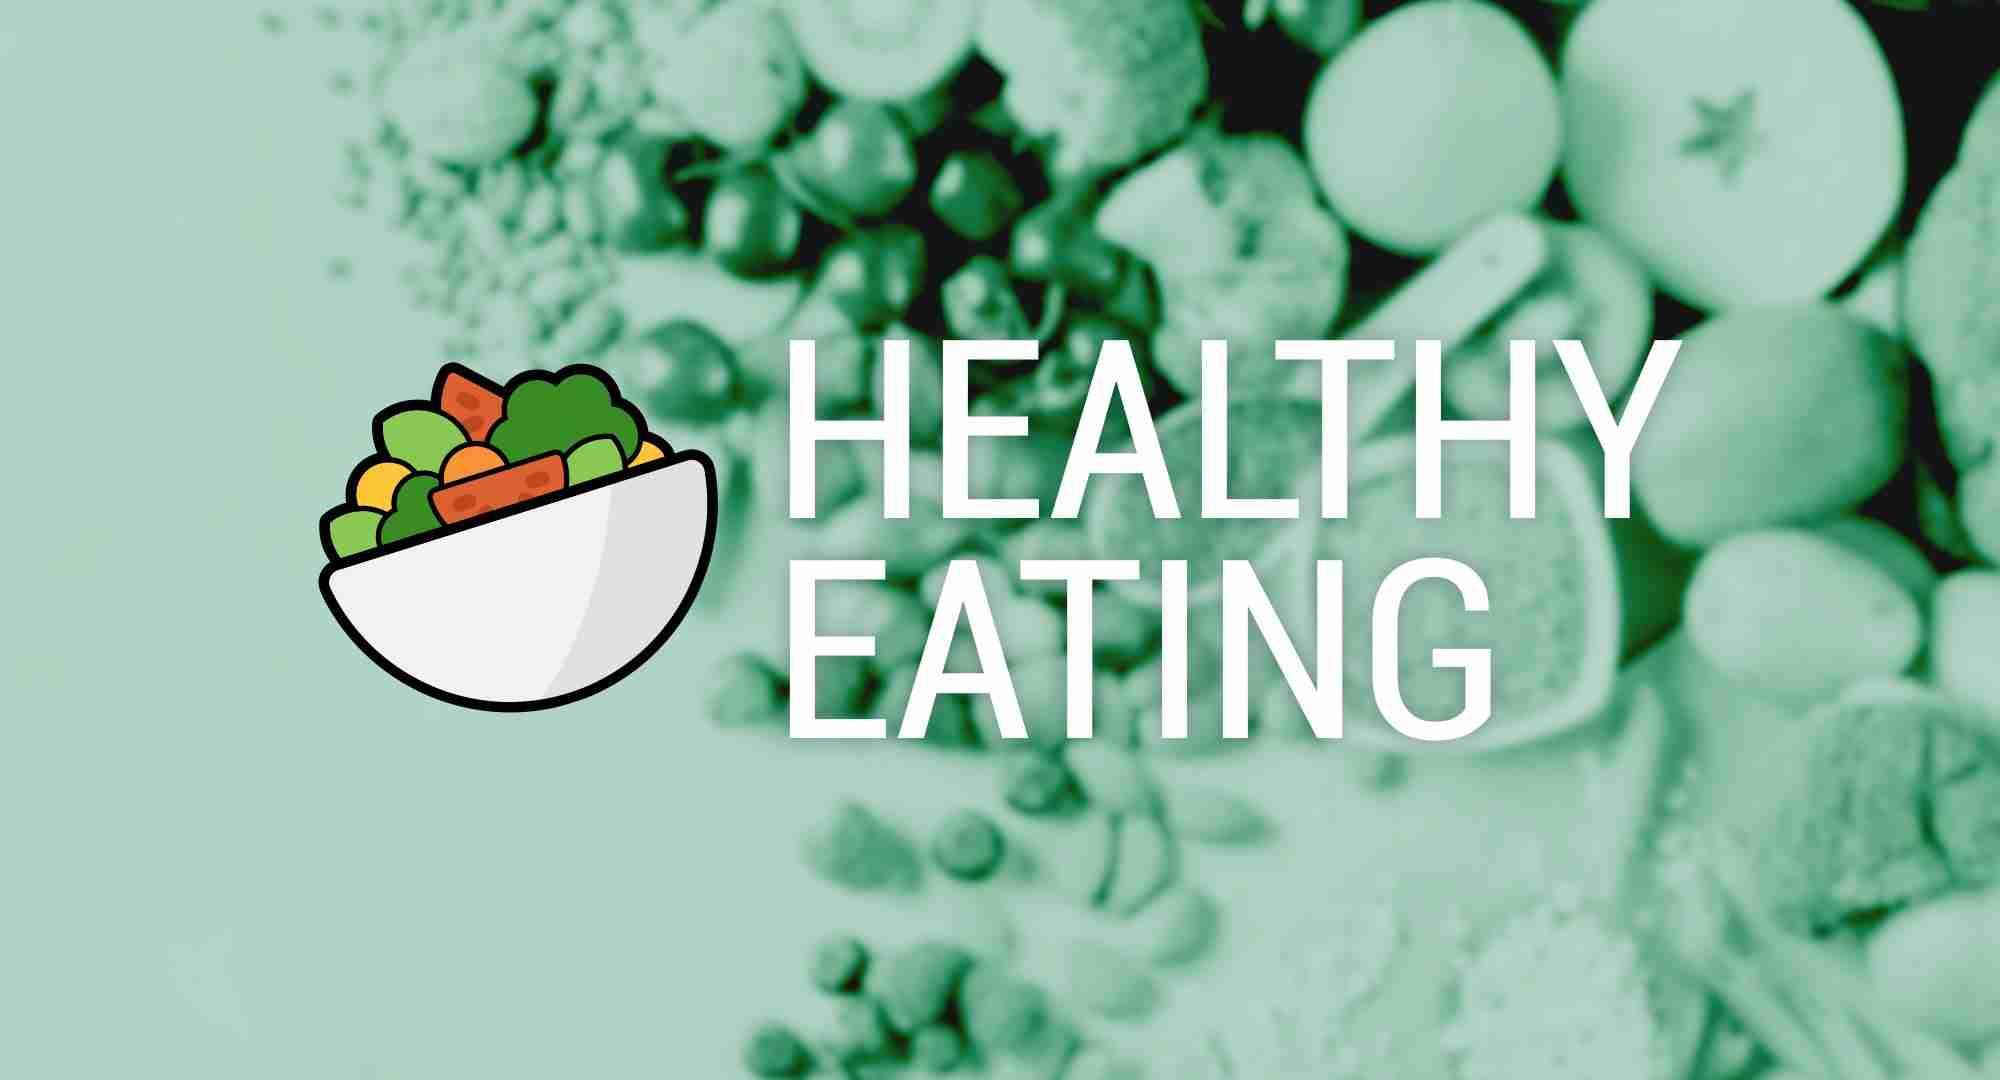 F1 HEALTHY NUTRITION